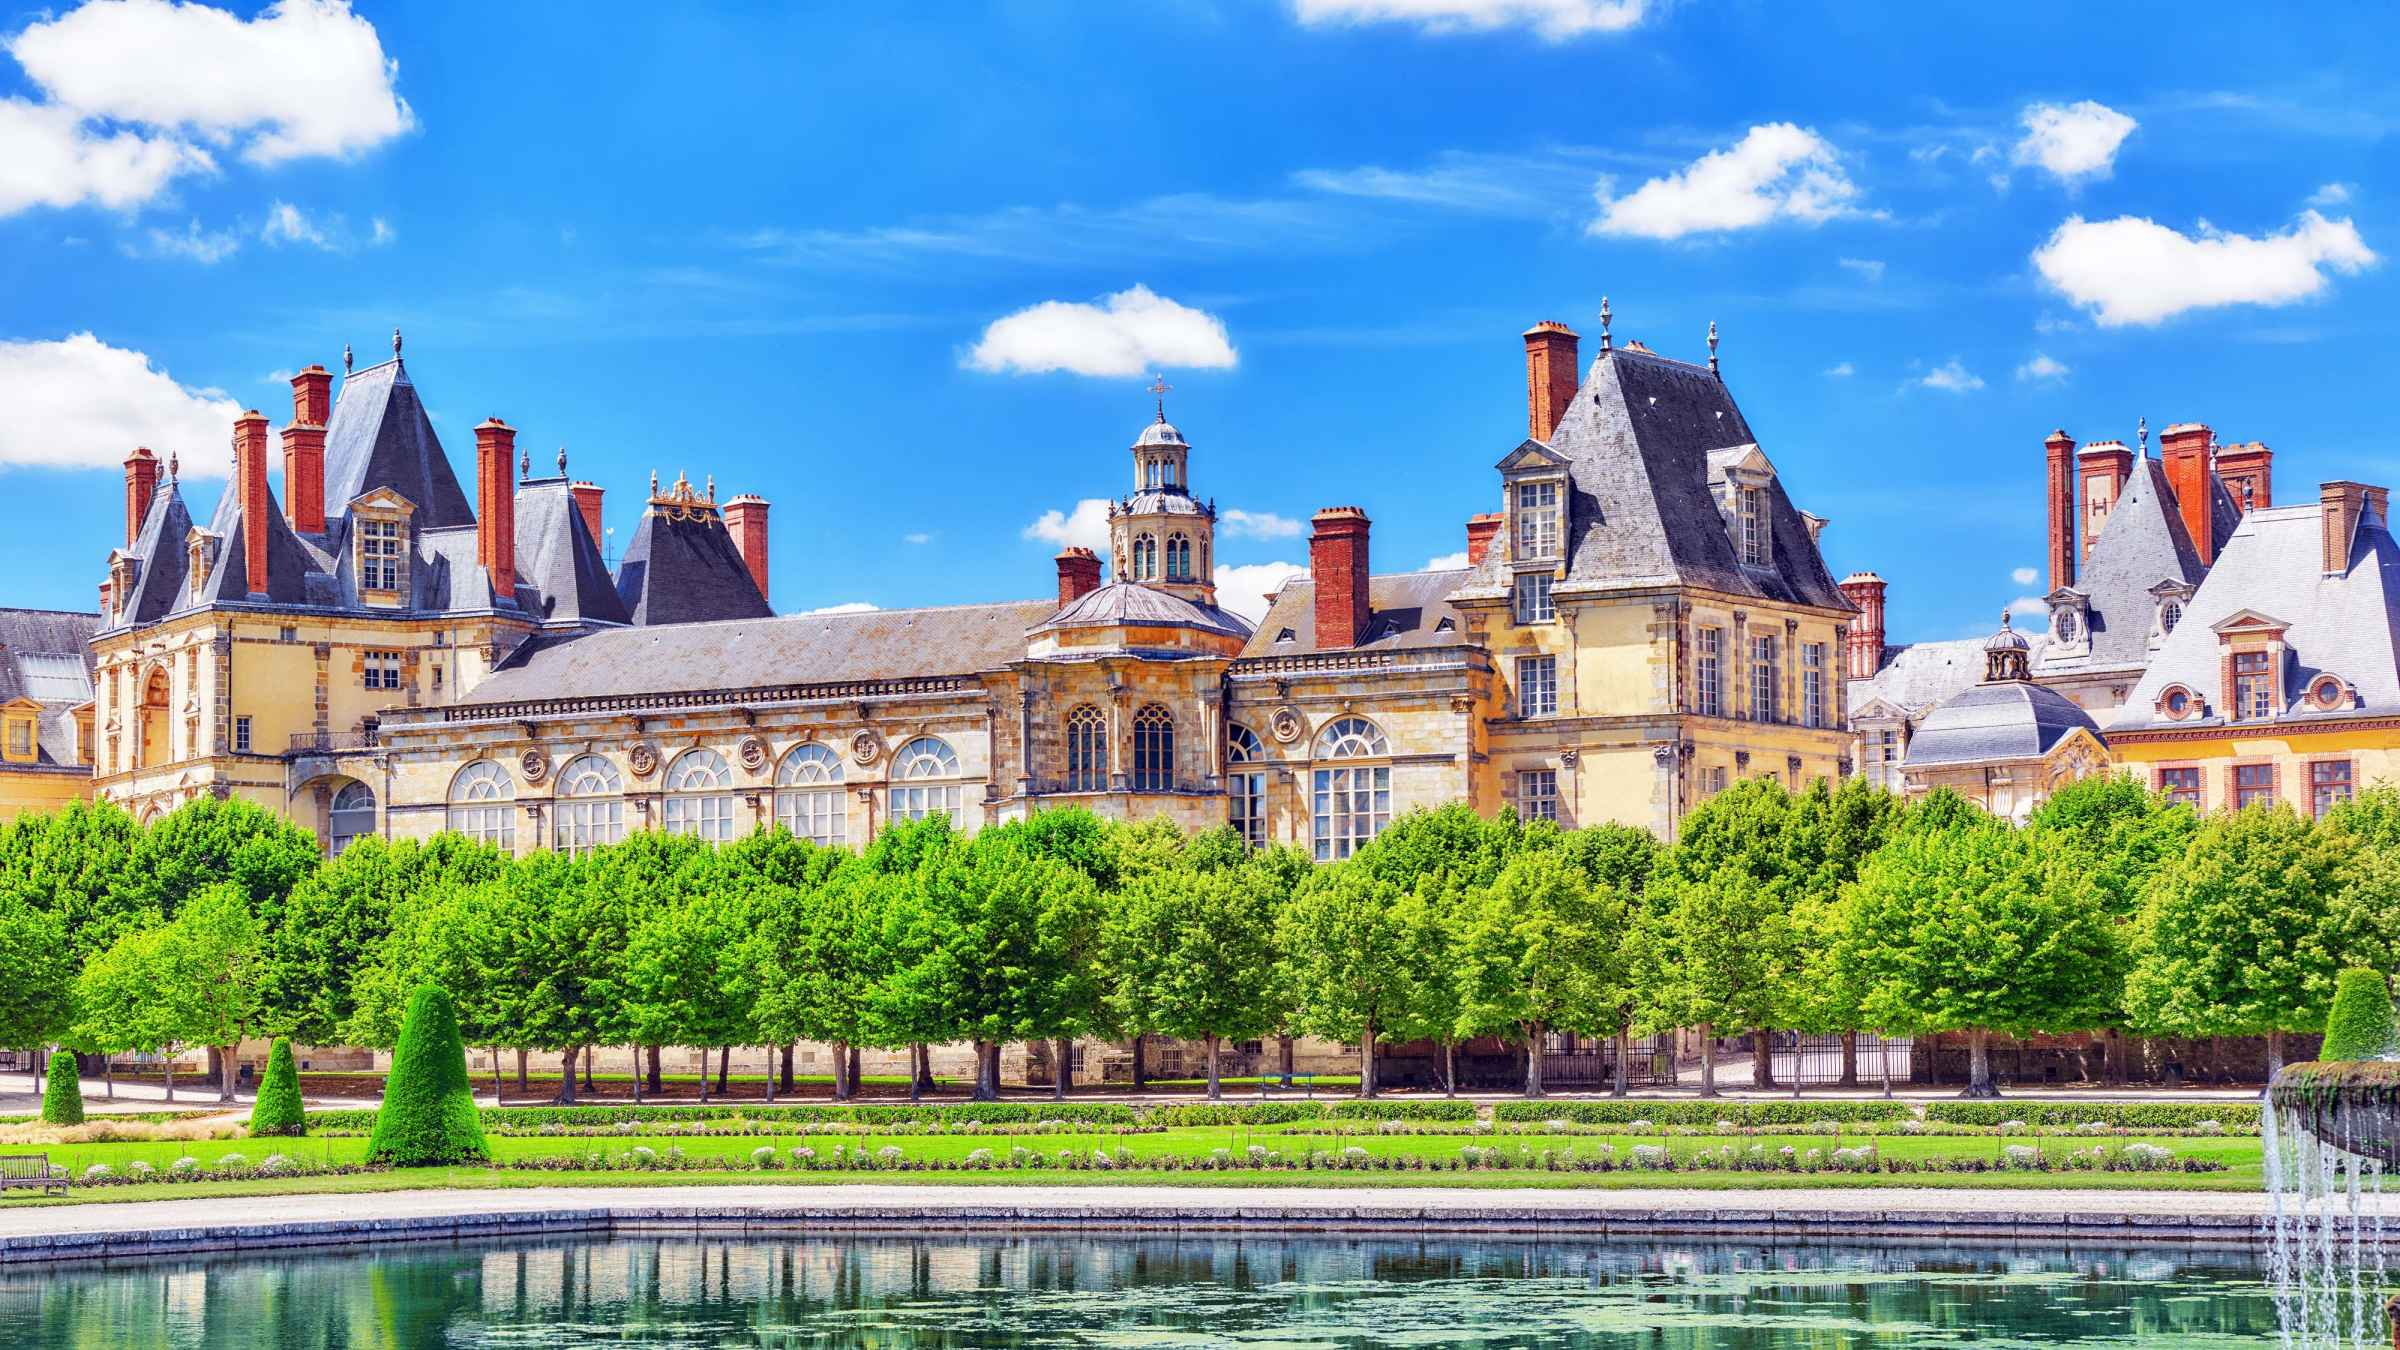 Caut o femeie pioasa Intalnire gratuita in Dordogne